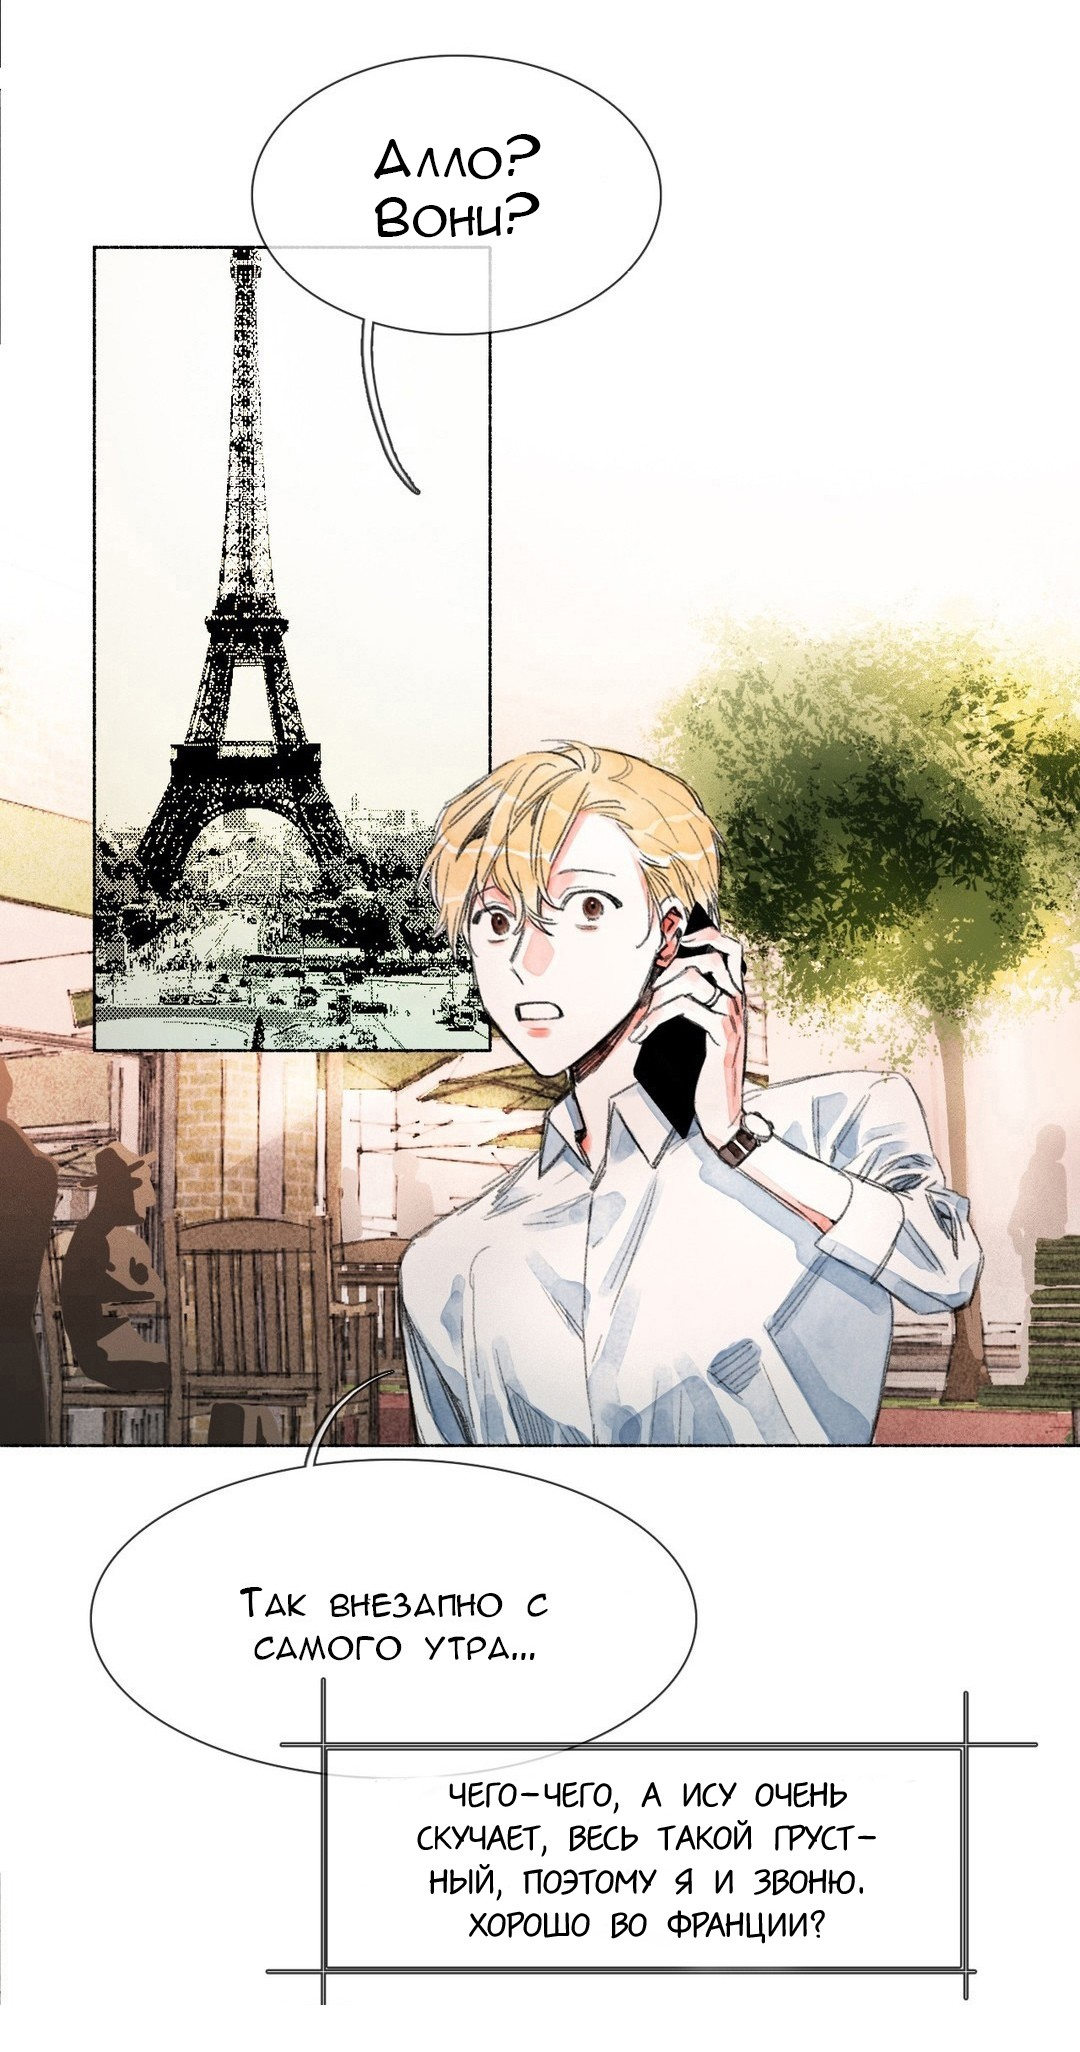 https://r2.ninemanga.com/comics/pic4/36/37860/1339494/155762298115.jpg Page 33